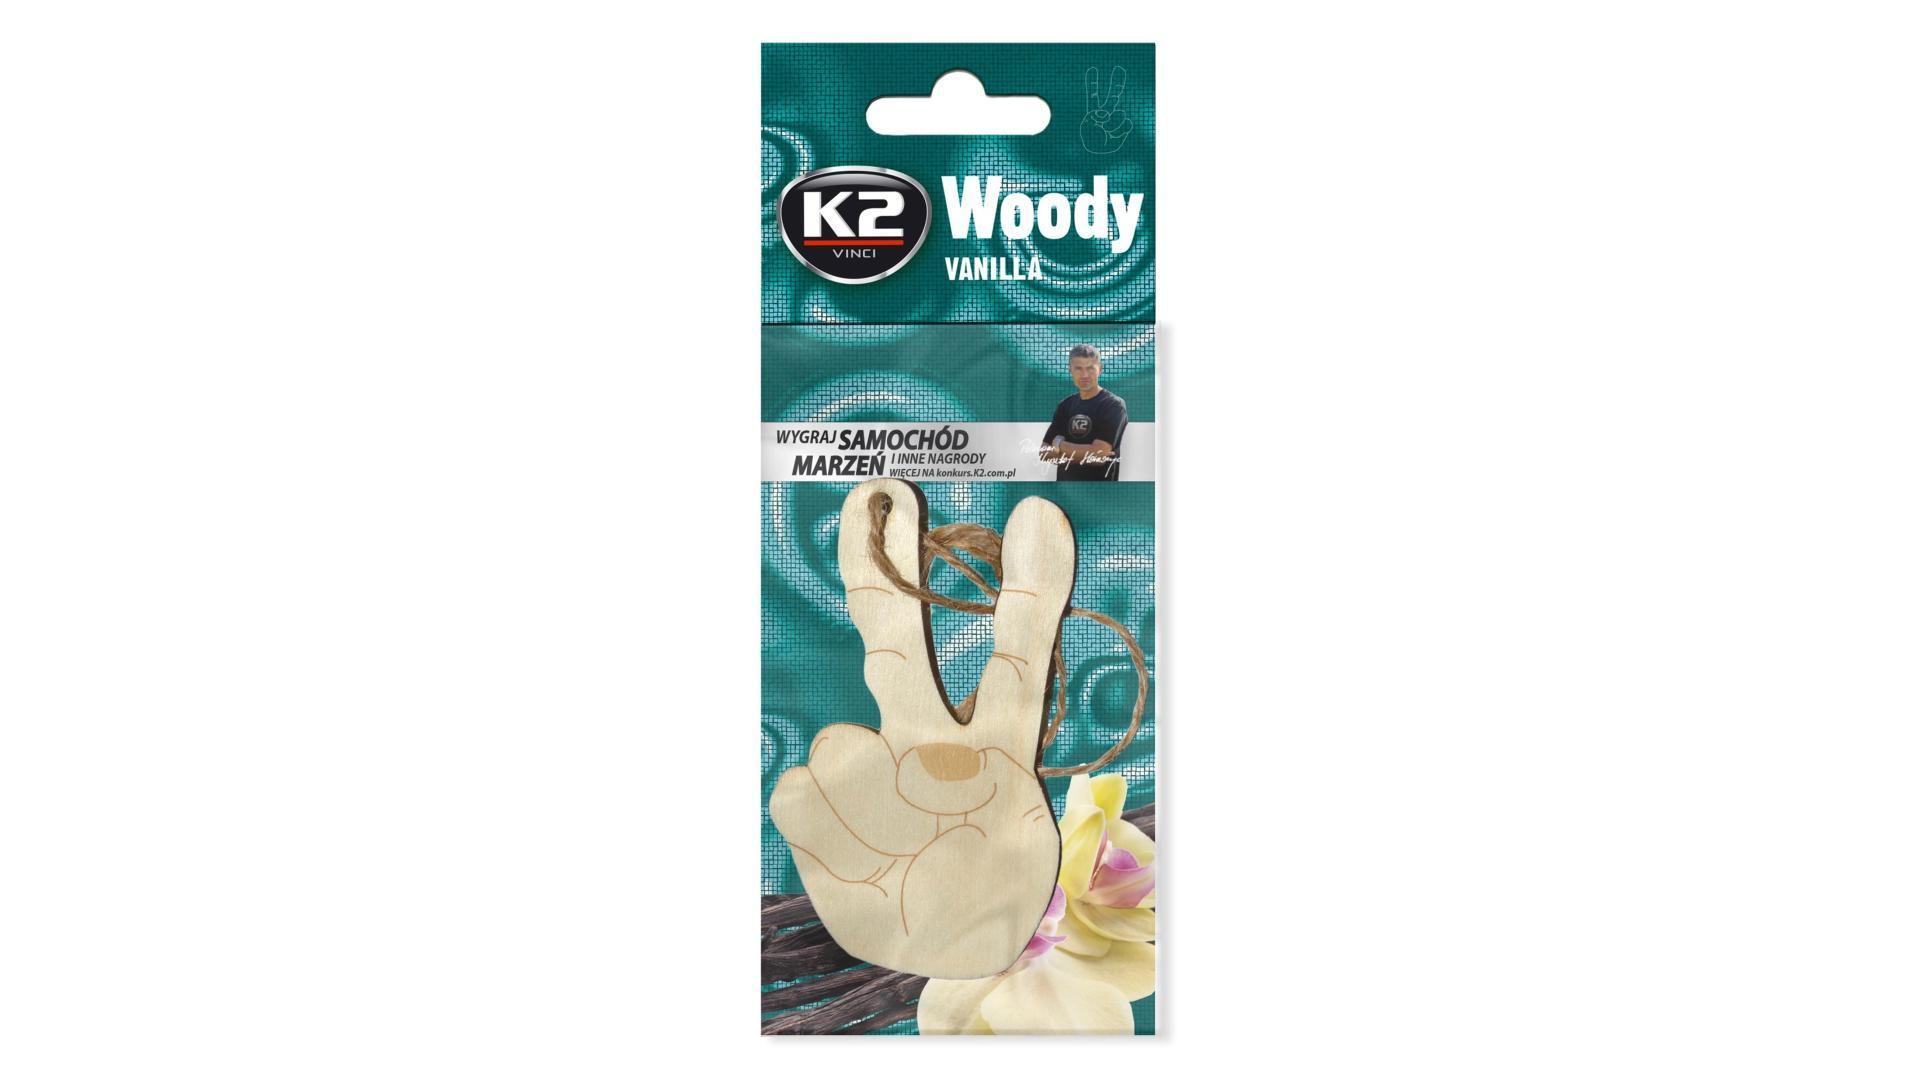 K2 Woody Victory Vanilla